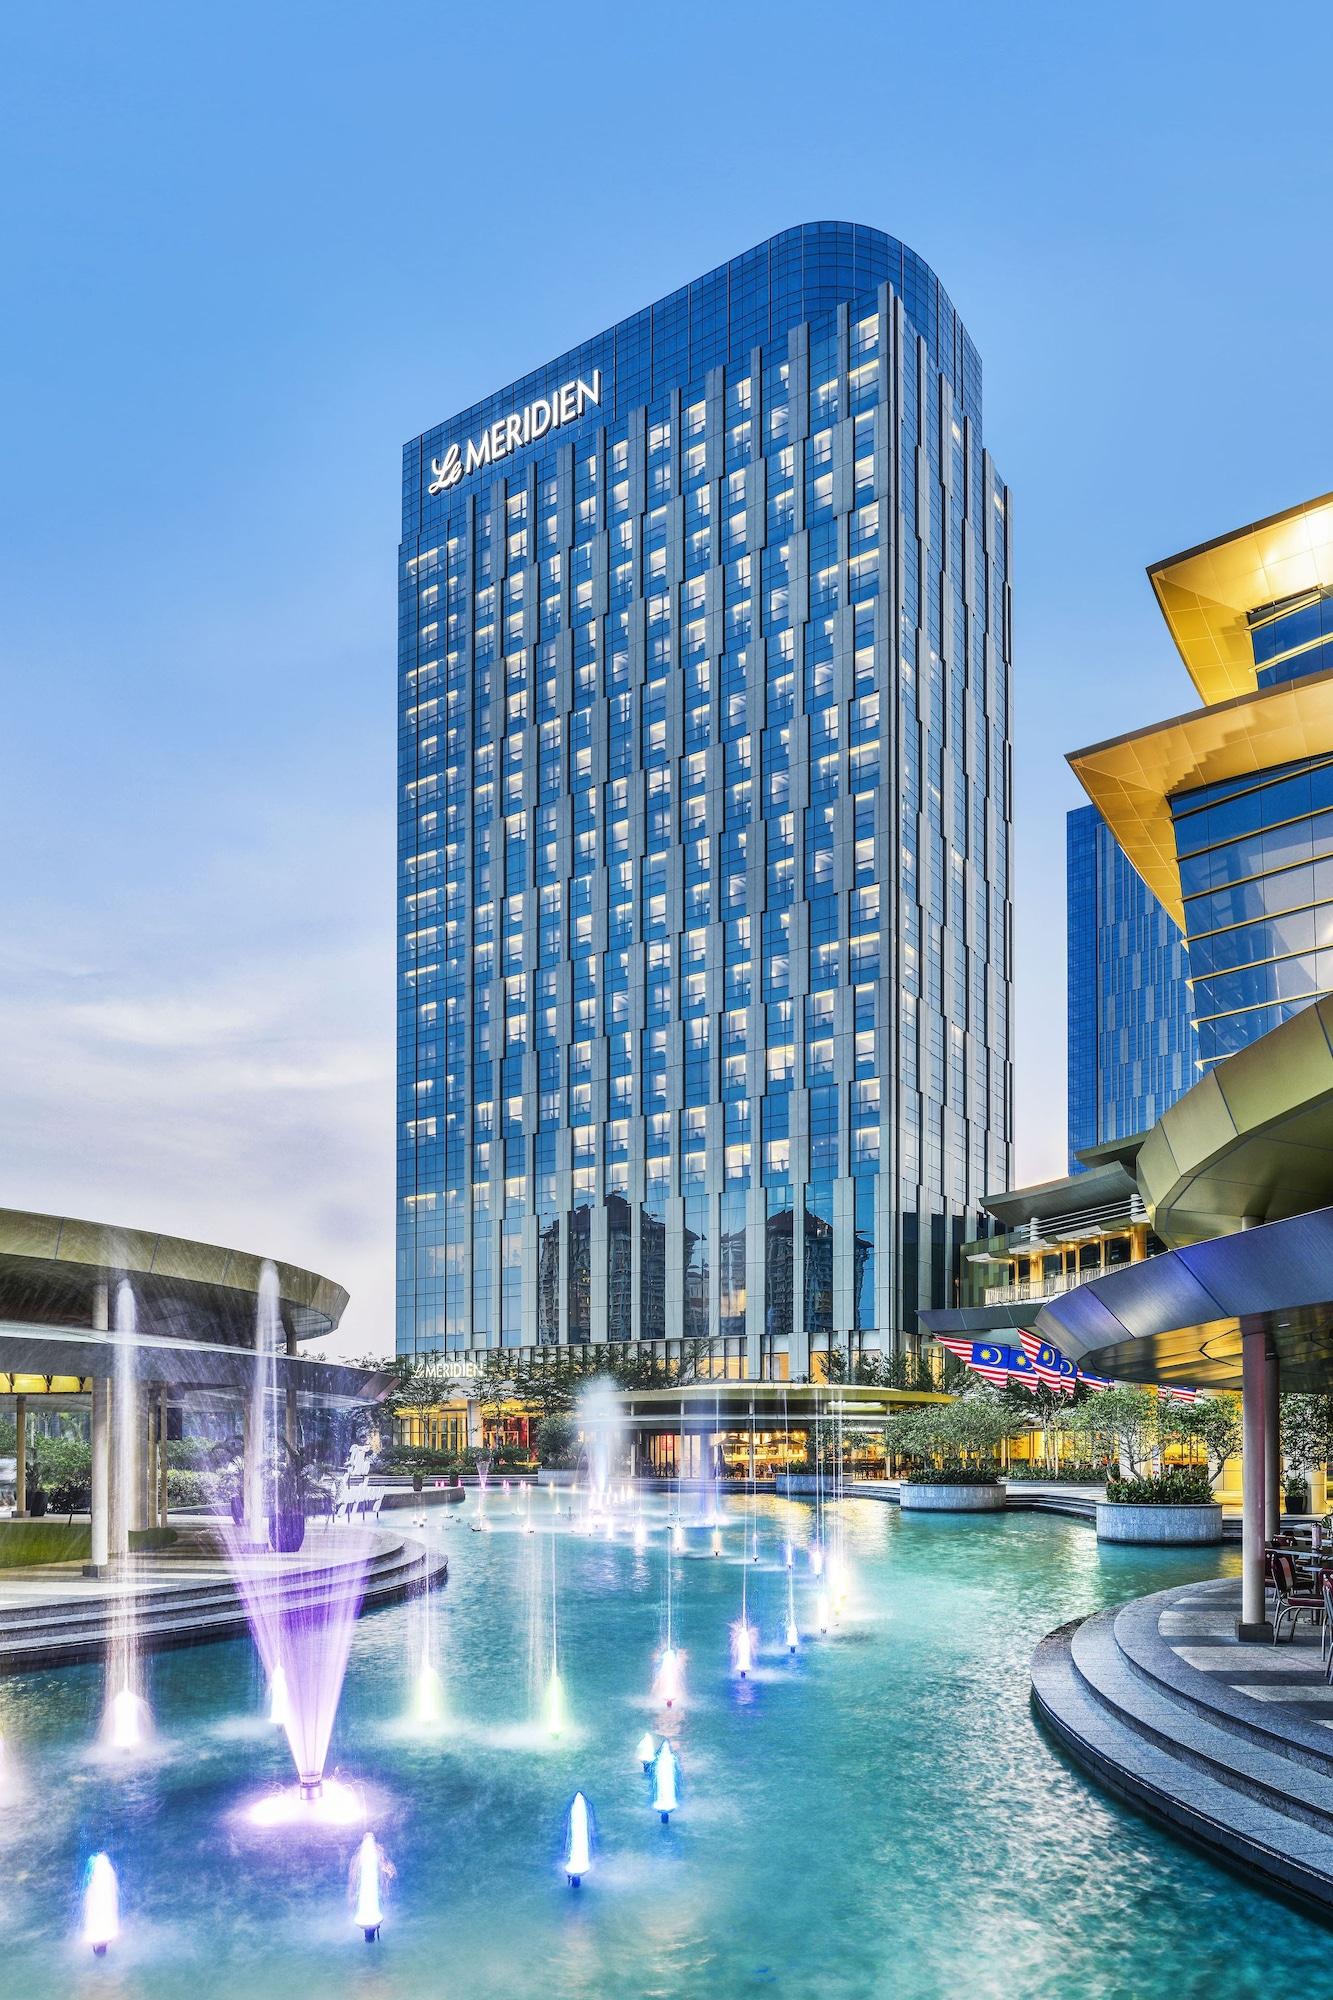 Le Méridien Putrajaya, Kuala Lumpur